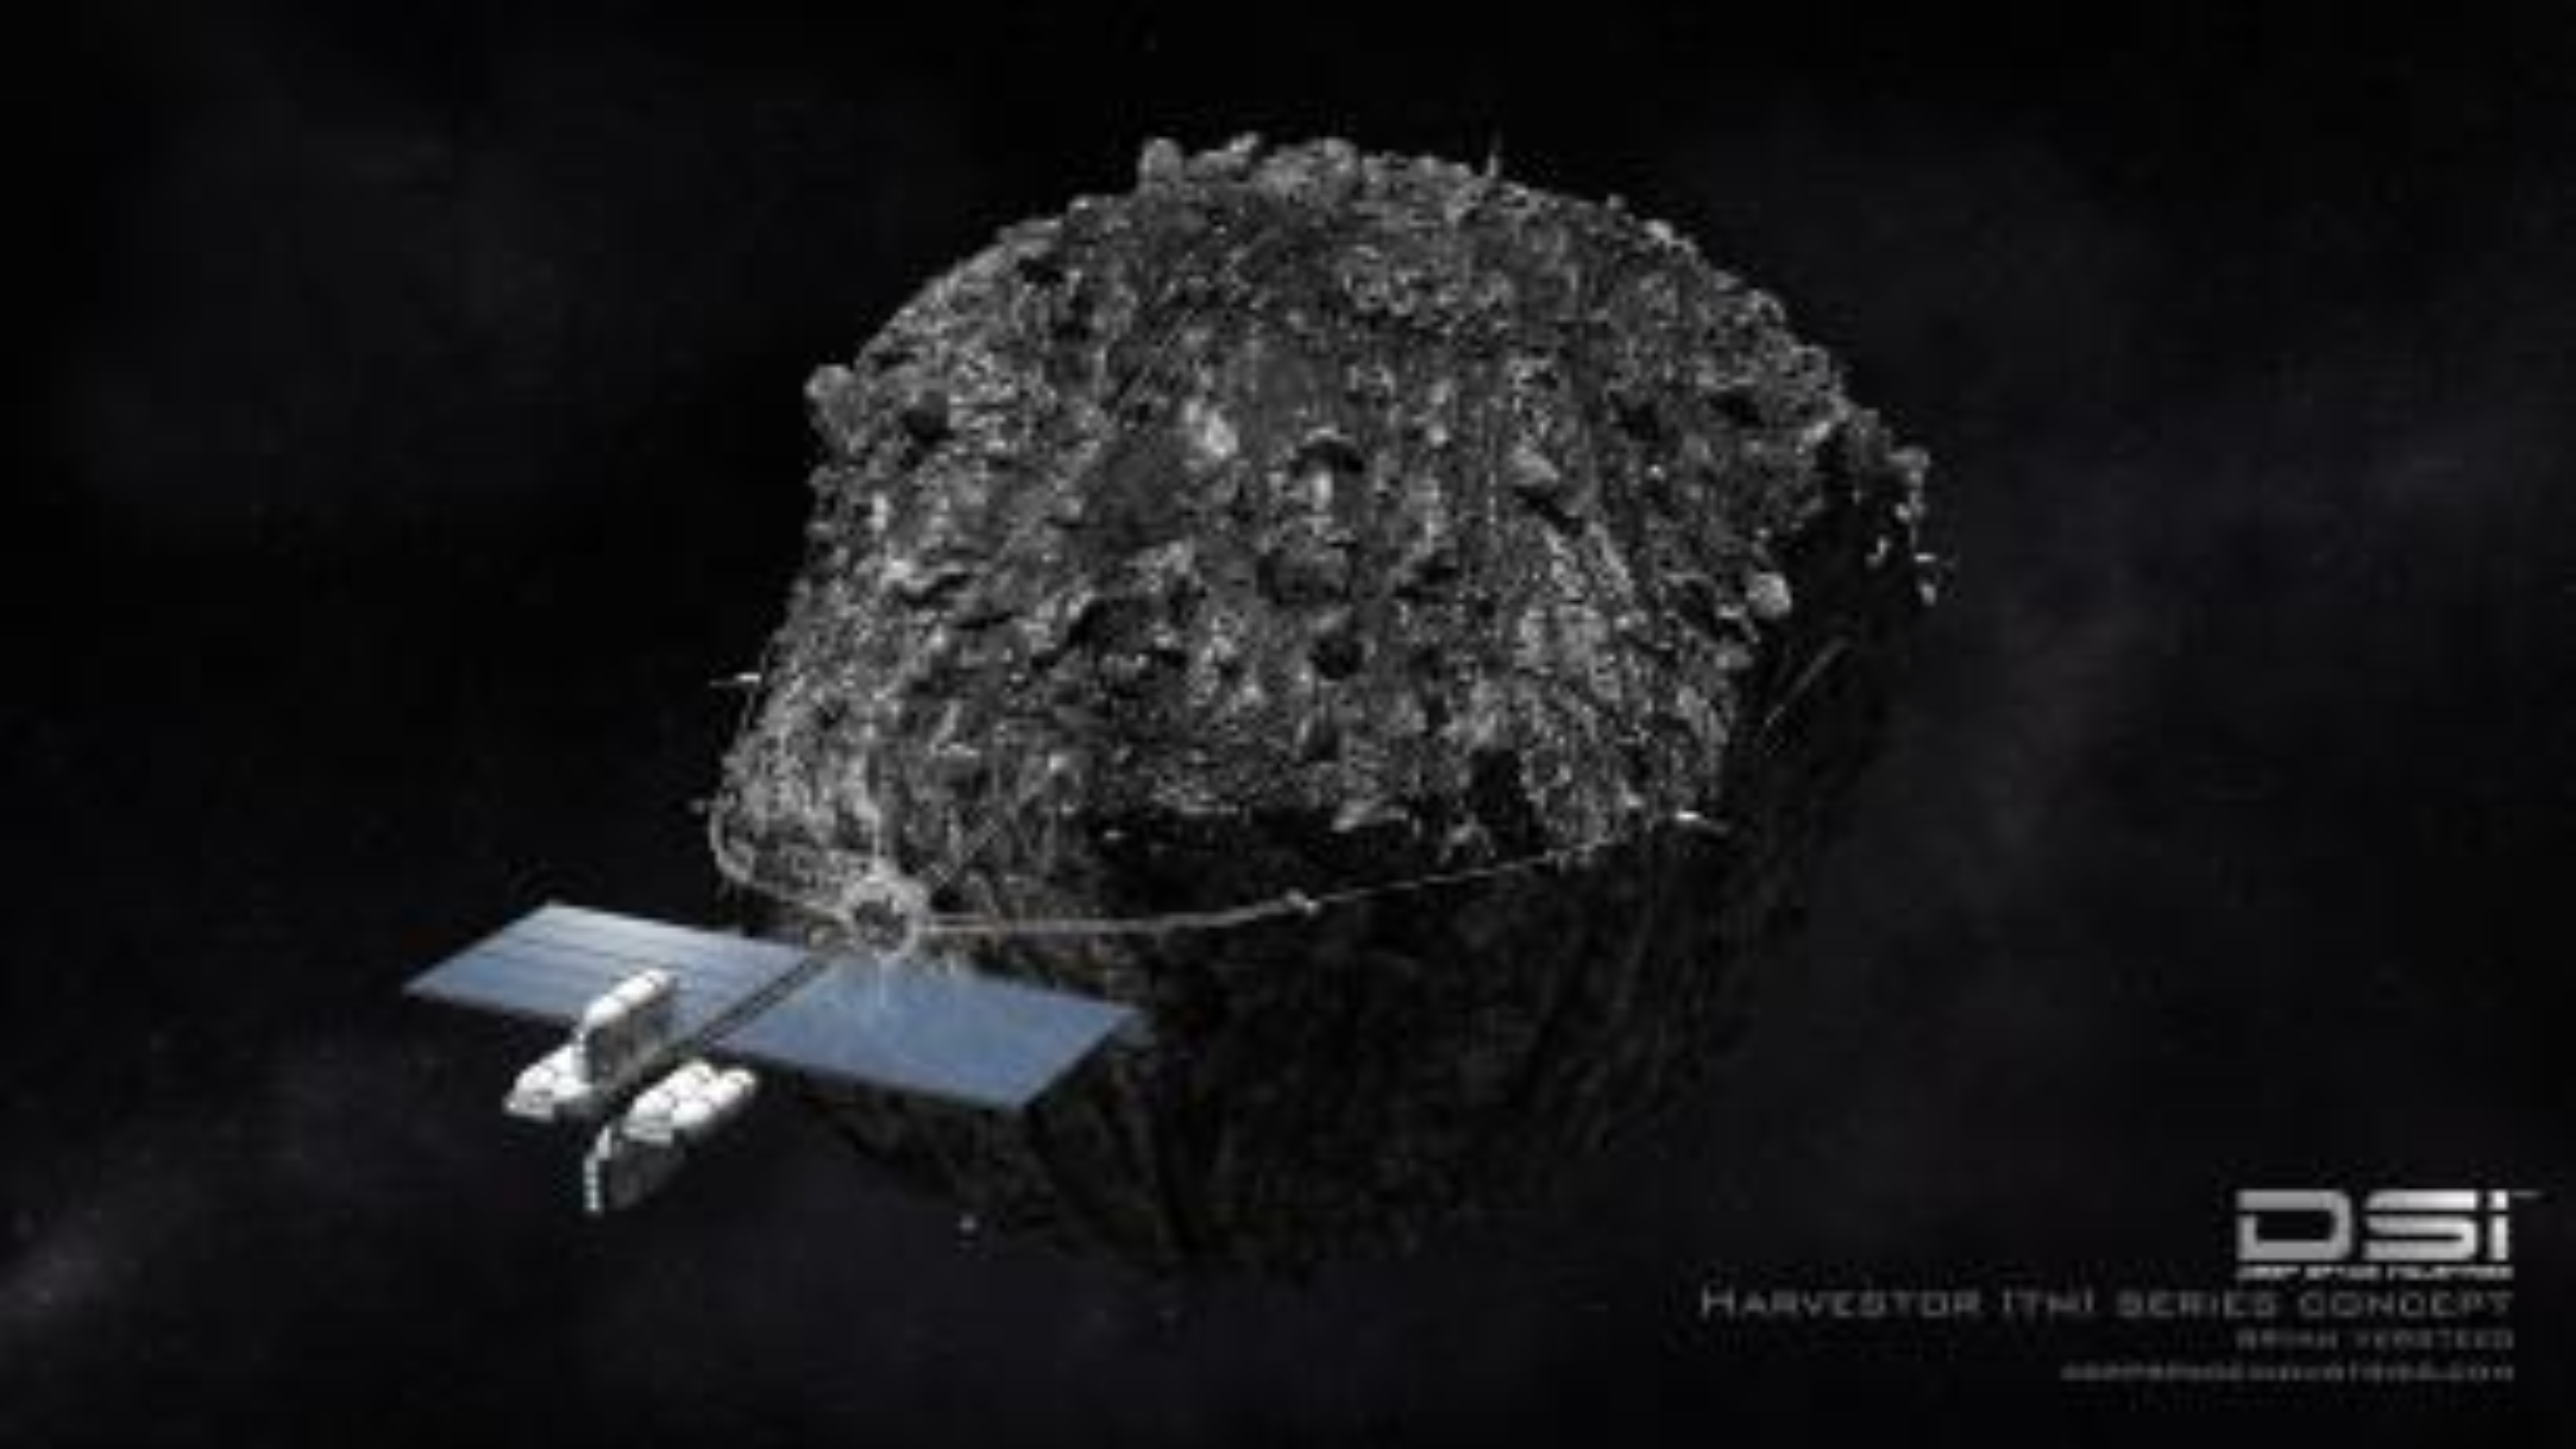 deep space industries asteroid mining harvester economics